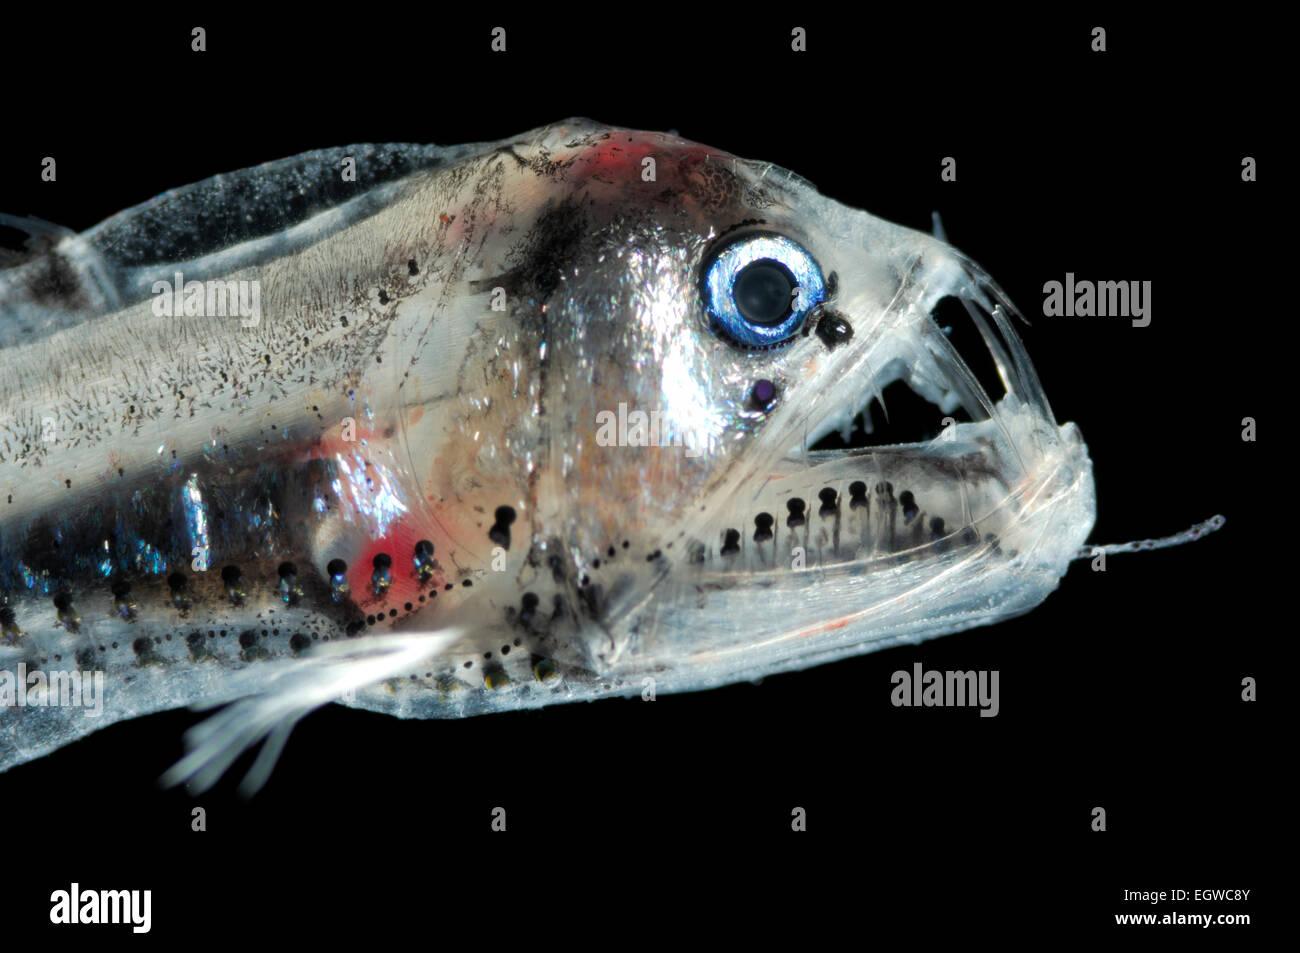 this fish is a juvenile viperfish (Chauliodus sloani)   Die Vipernfische (Chauliodus sloani), im Bild ein juveniles - Stock Image